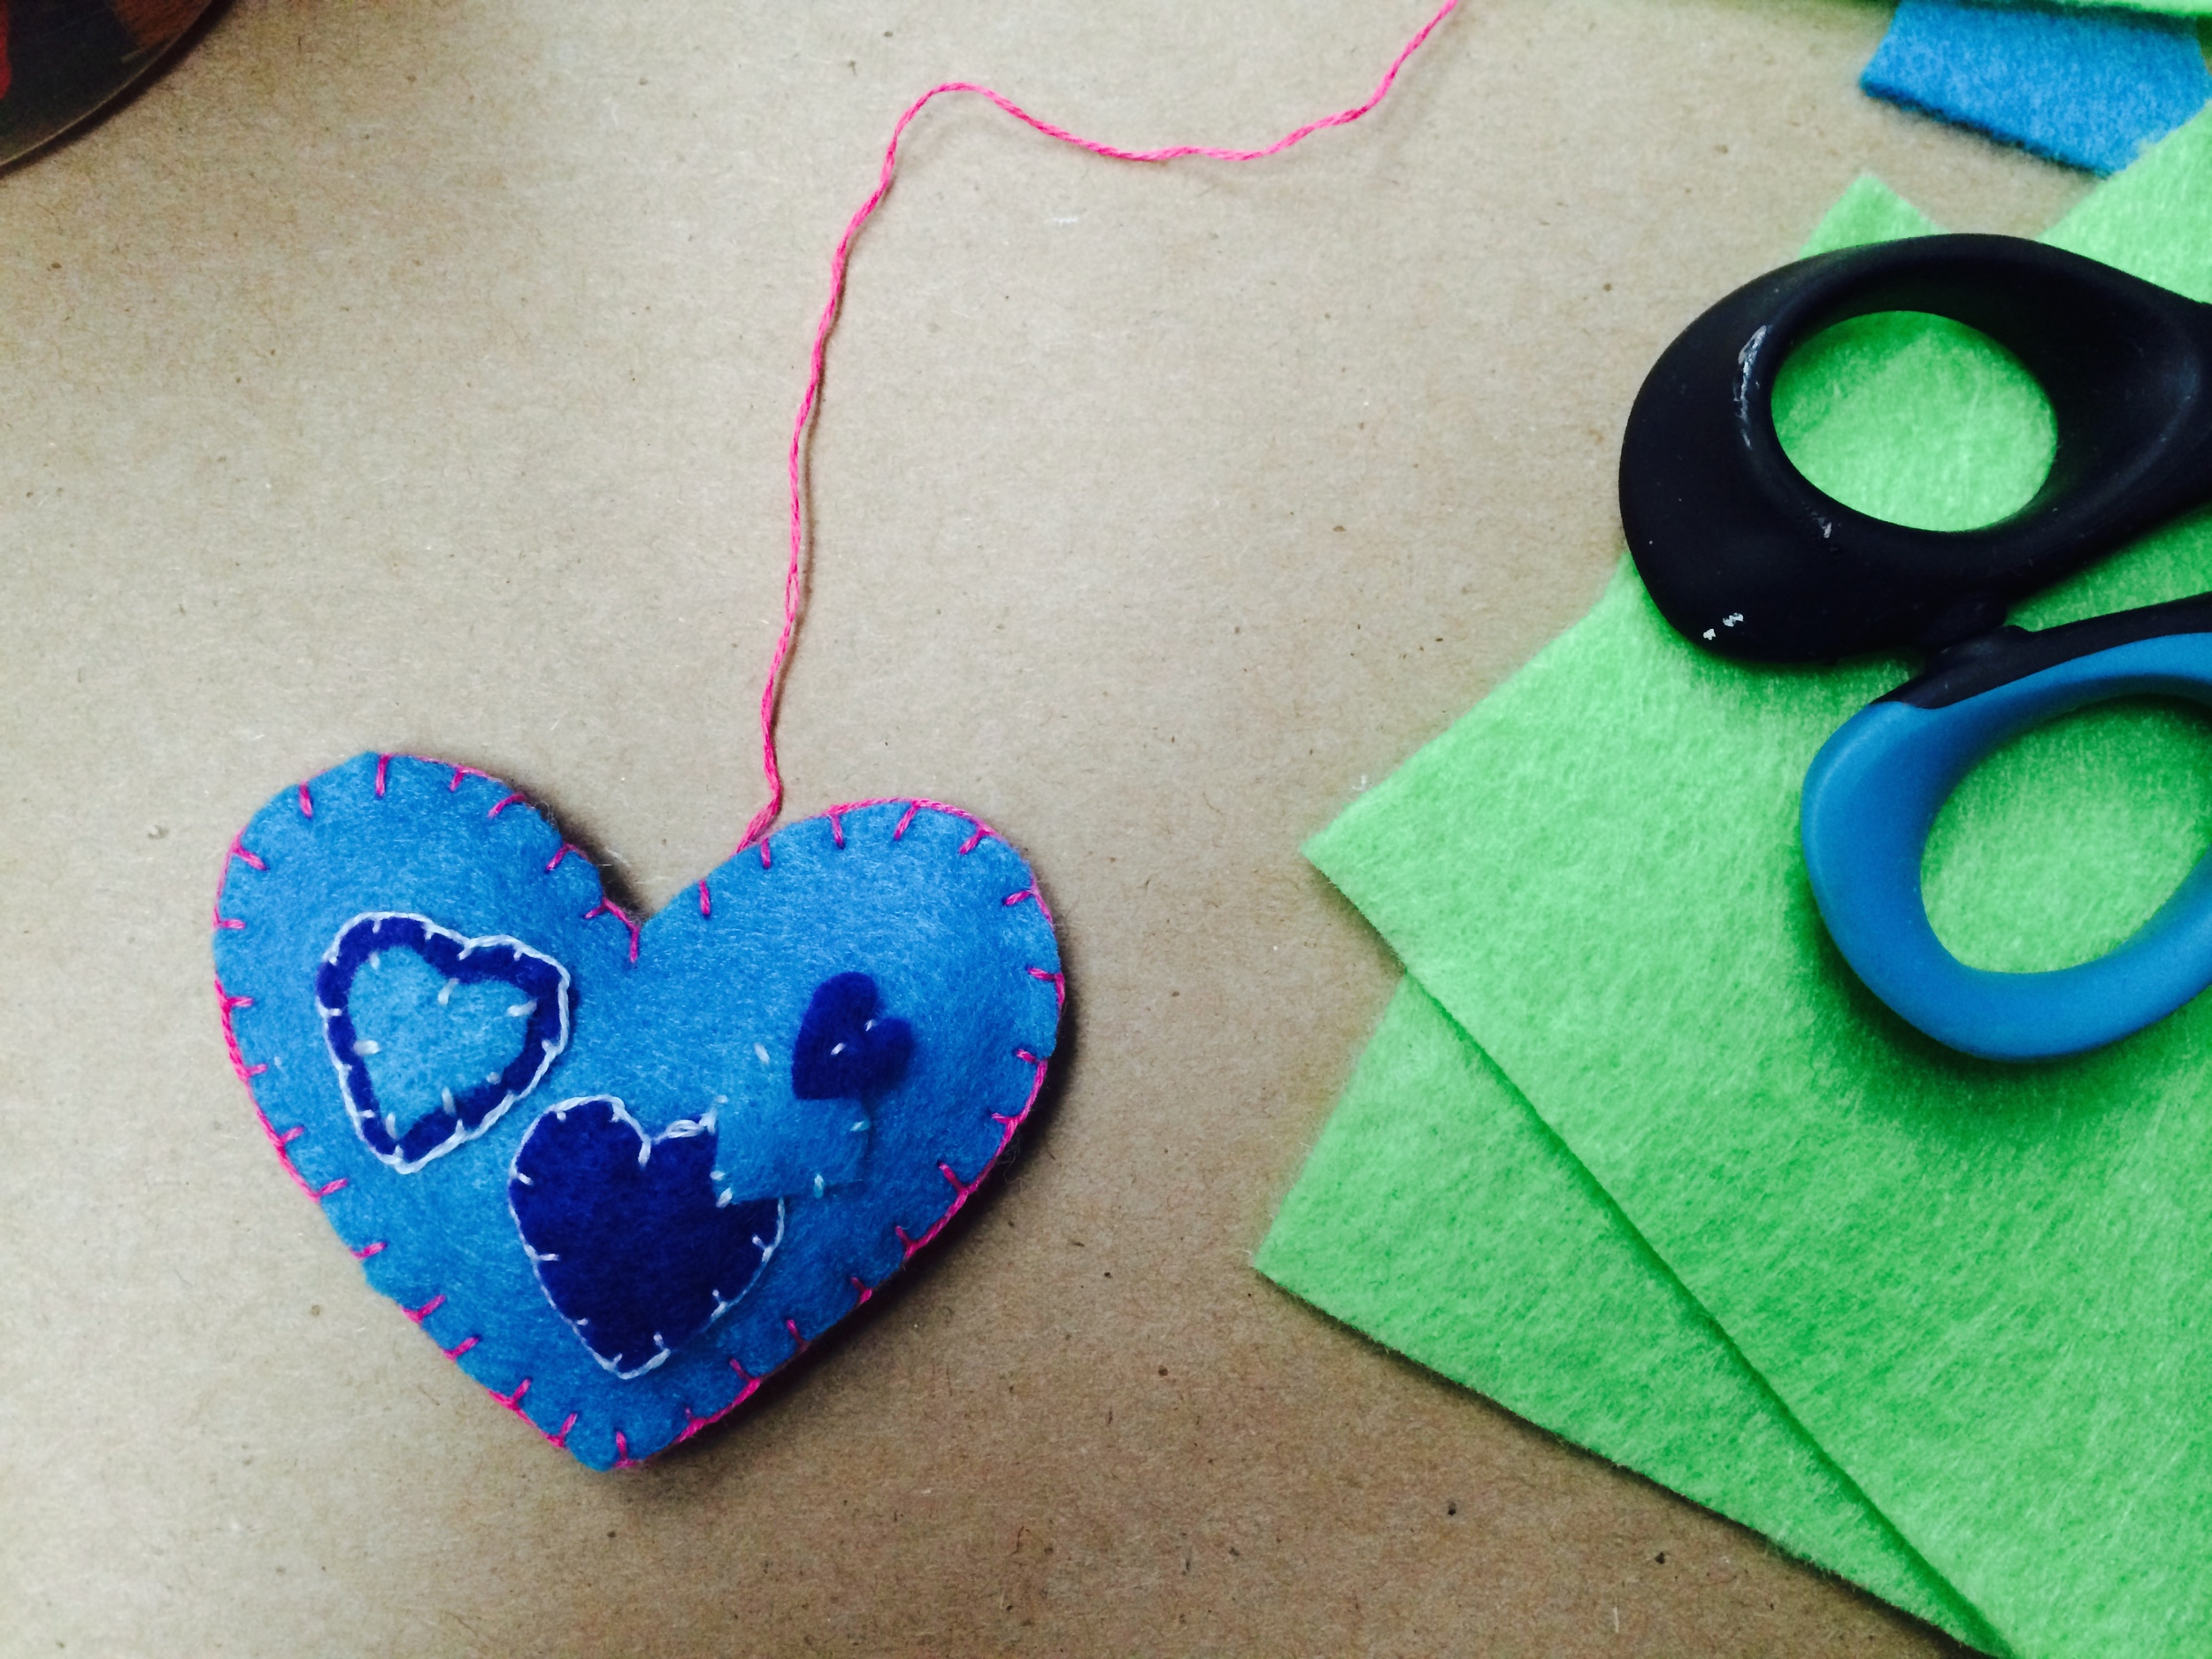 Gorgeous hand-sewn blue heart - beautiful blanket stitch!